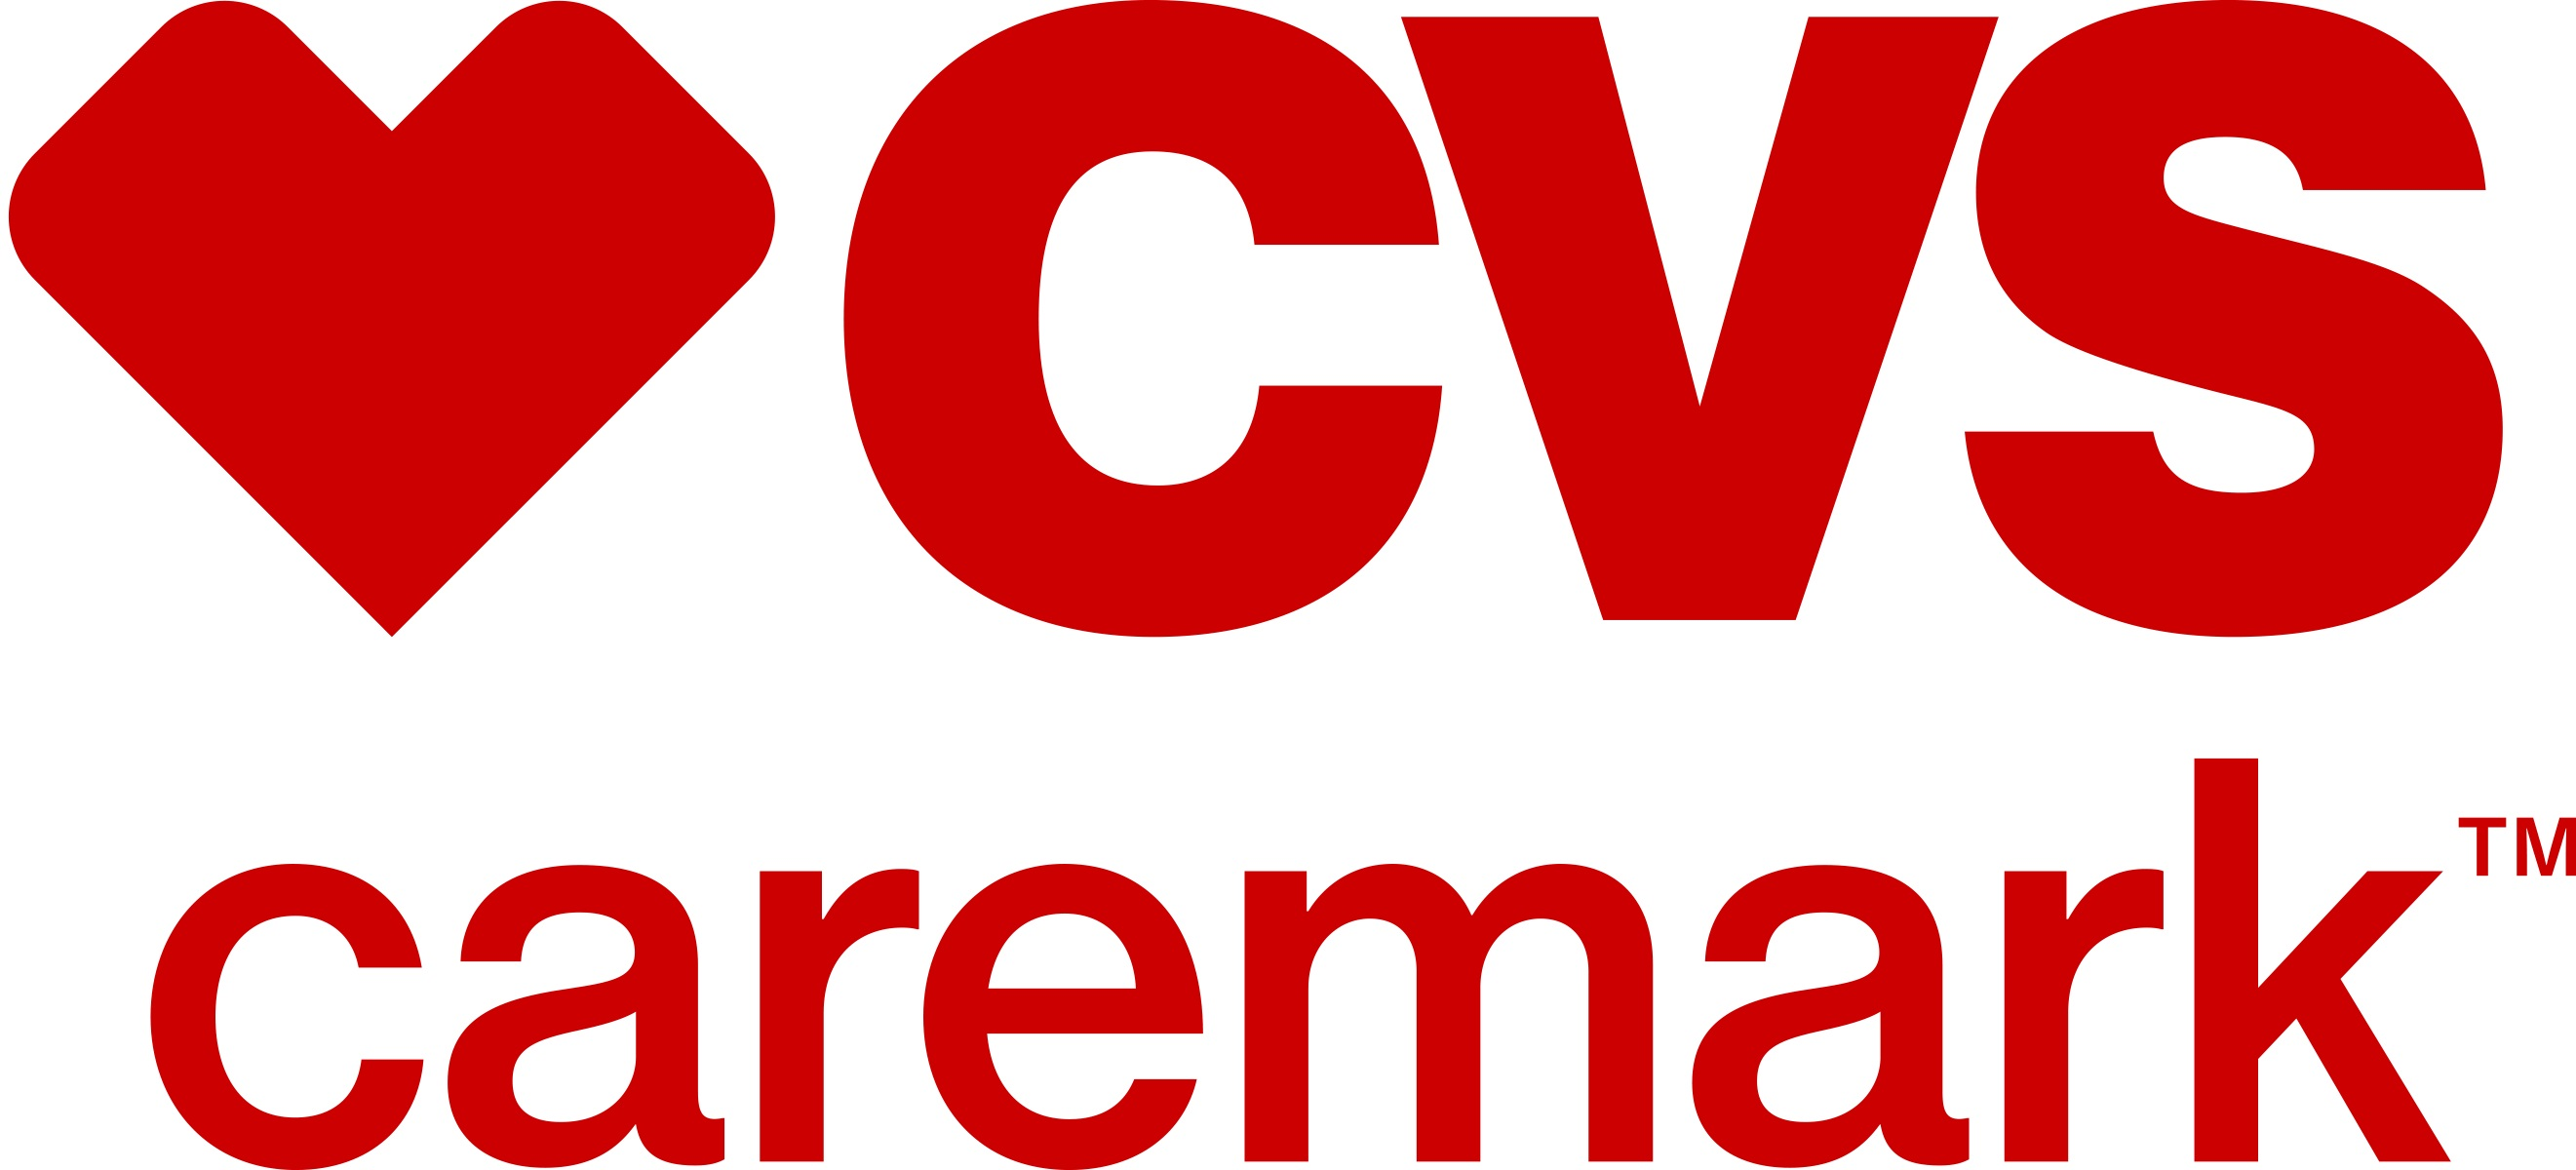 caremark customer service number 800 509 9891